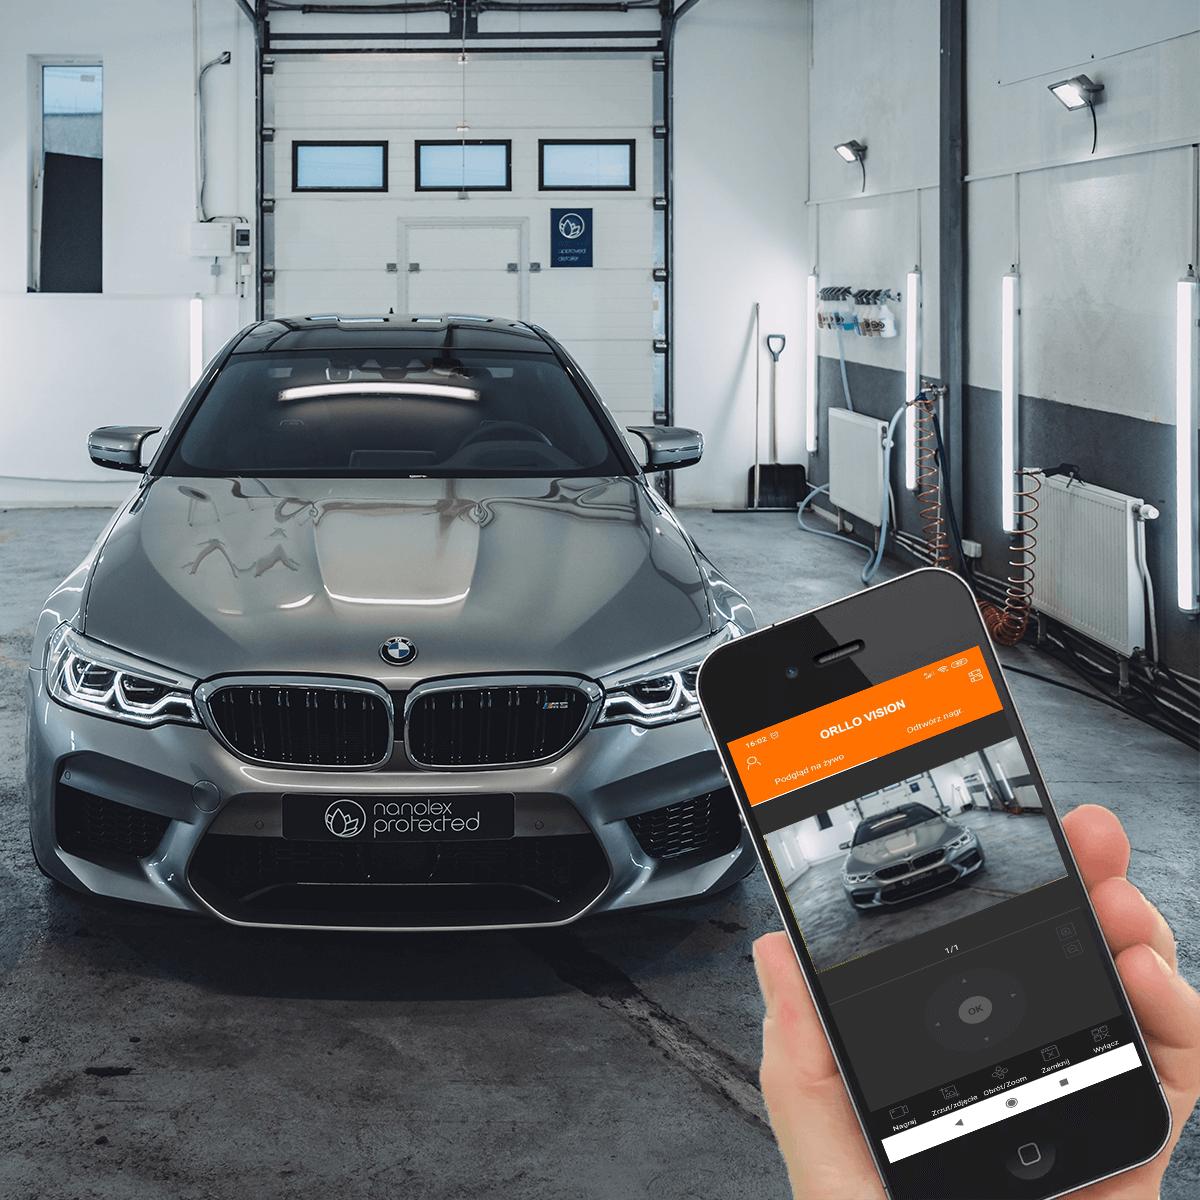 kamera do monitoringu garażu z podglądem orllo.pl